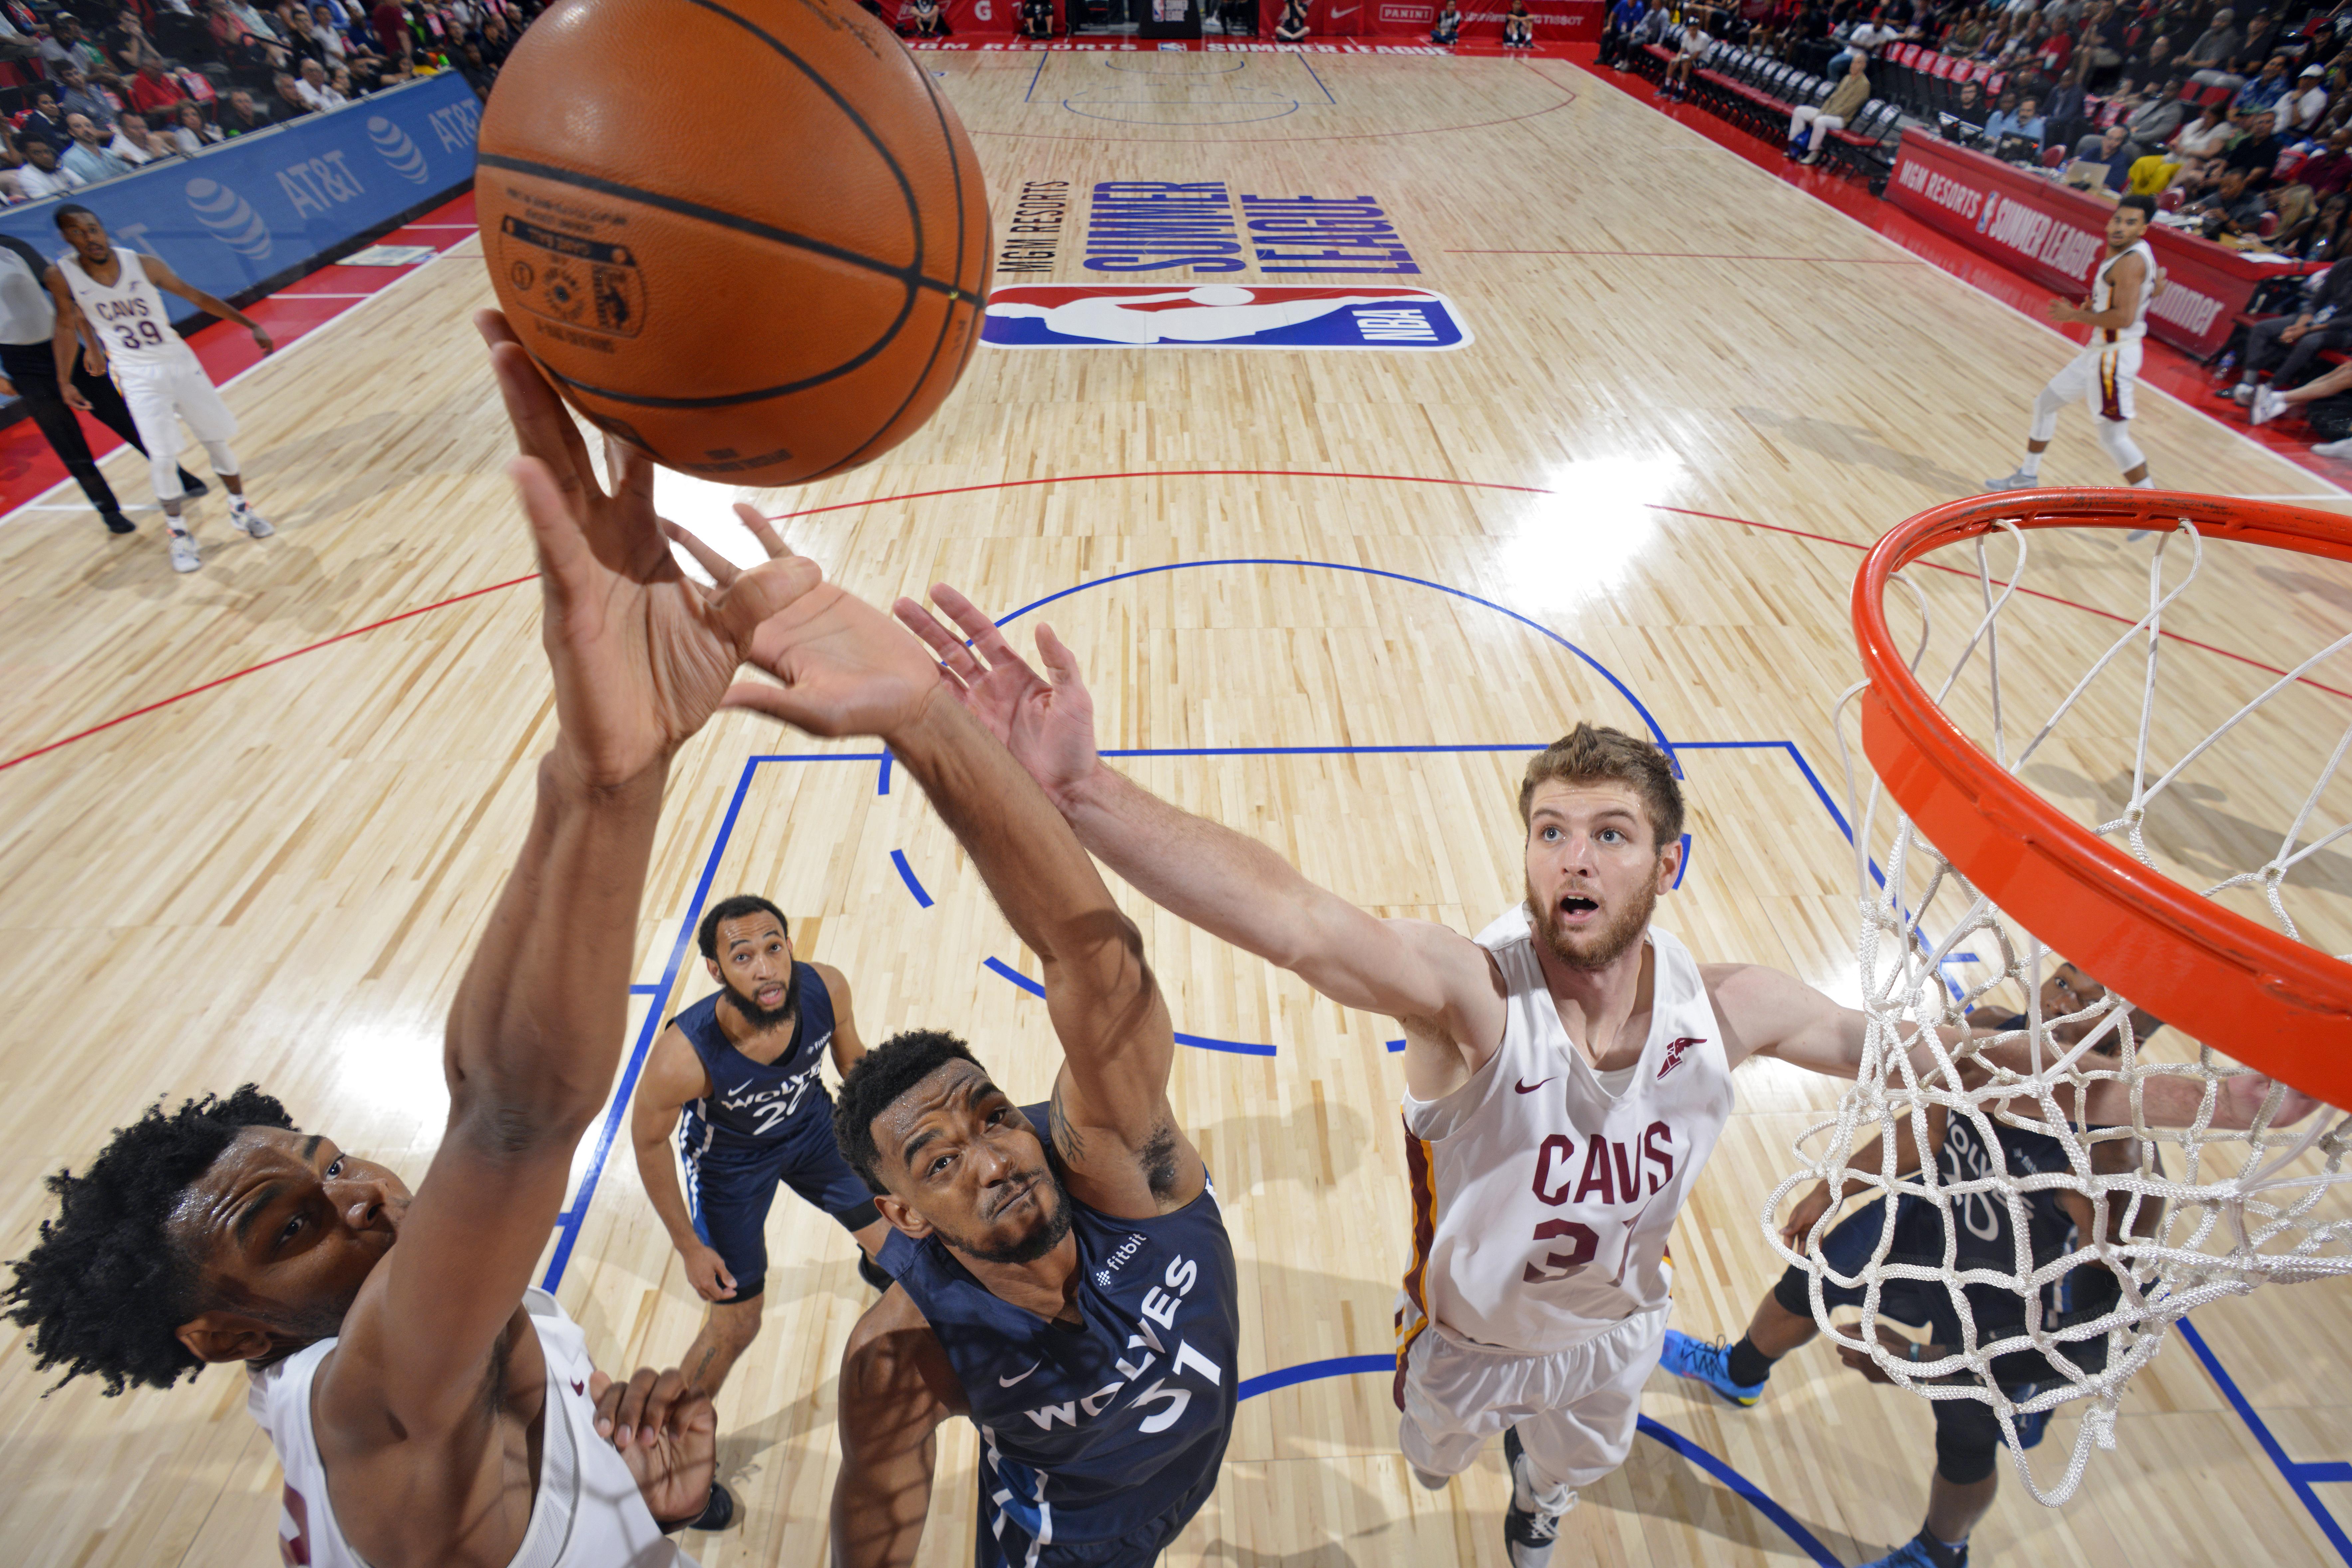 2019 Las Vegas Summer League - Day 1 - Minnesota Timberwolves v Cleveland Cavaliers